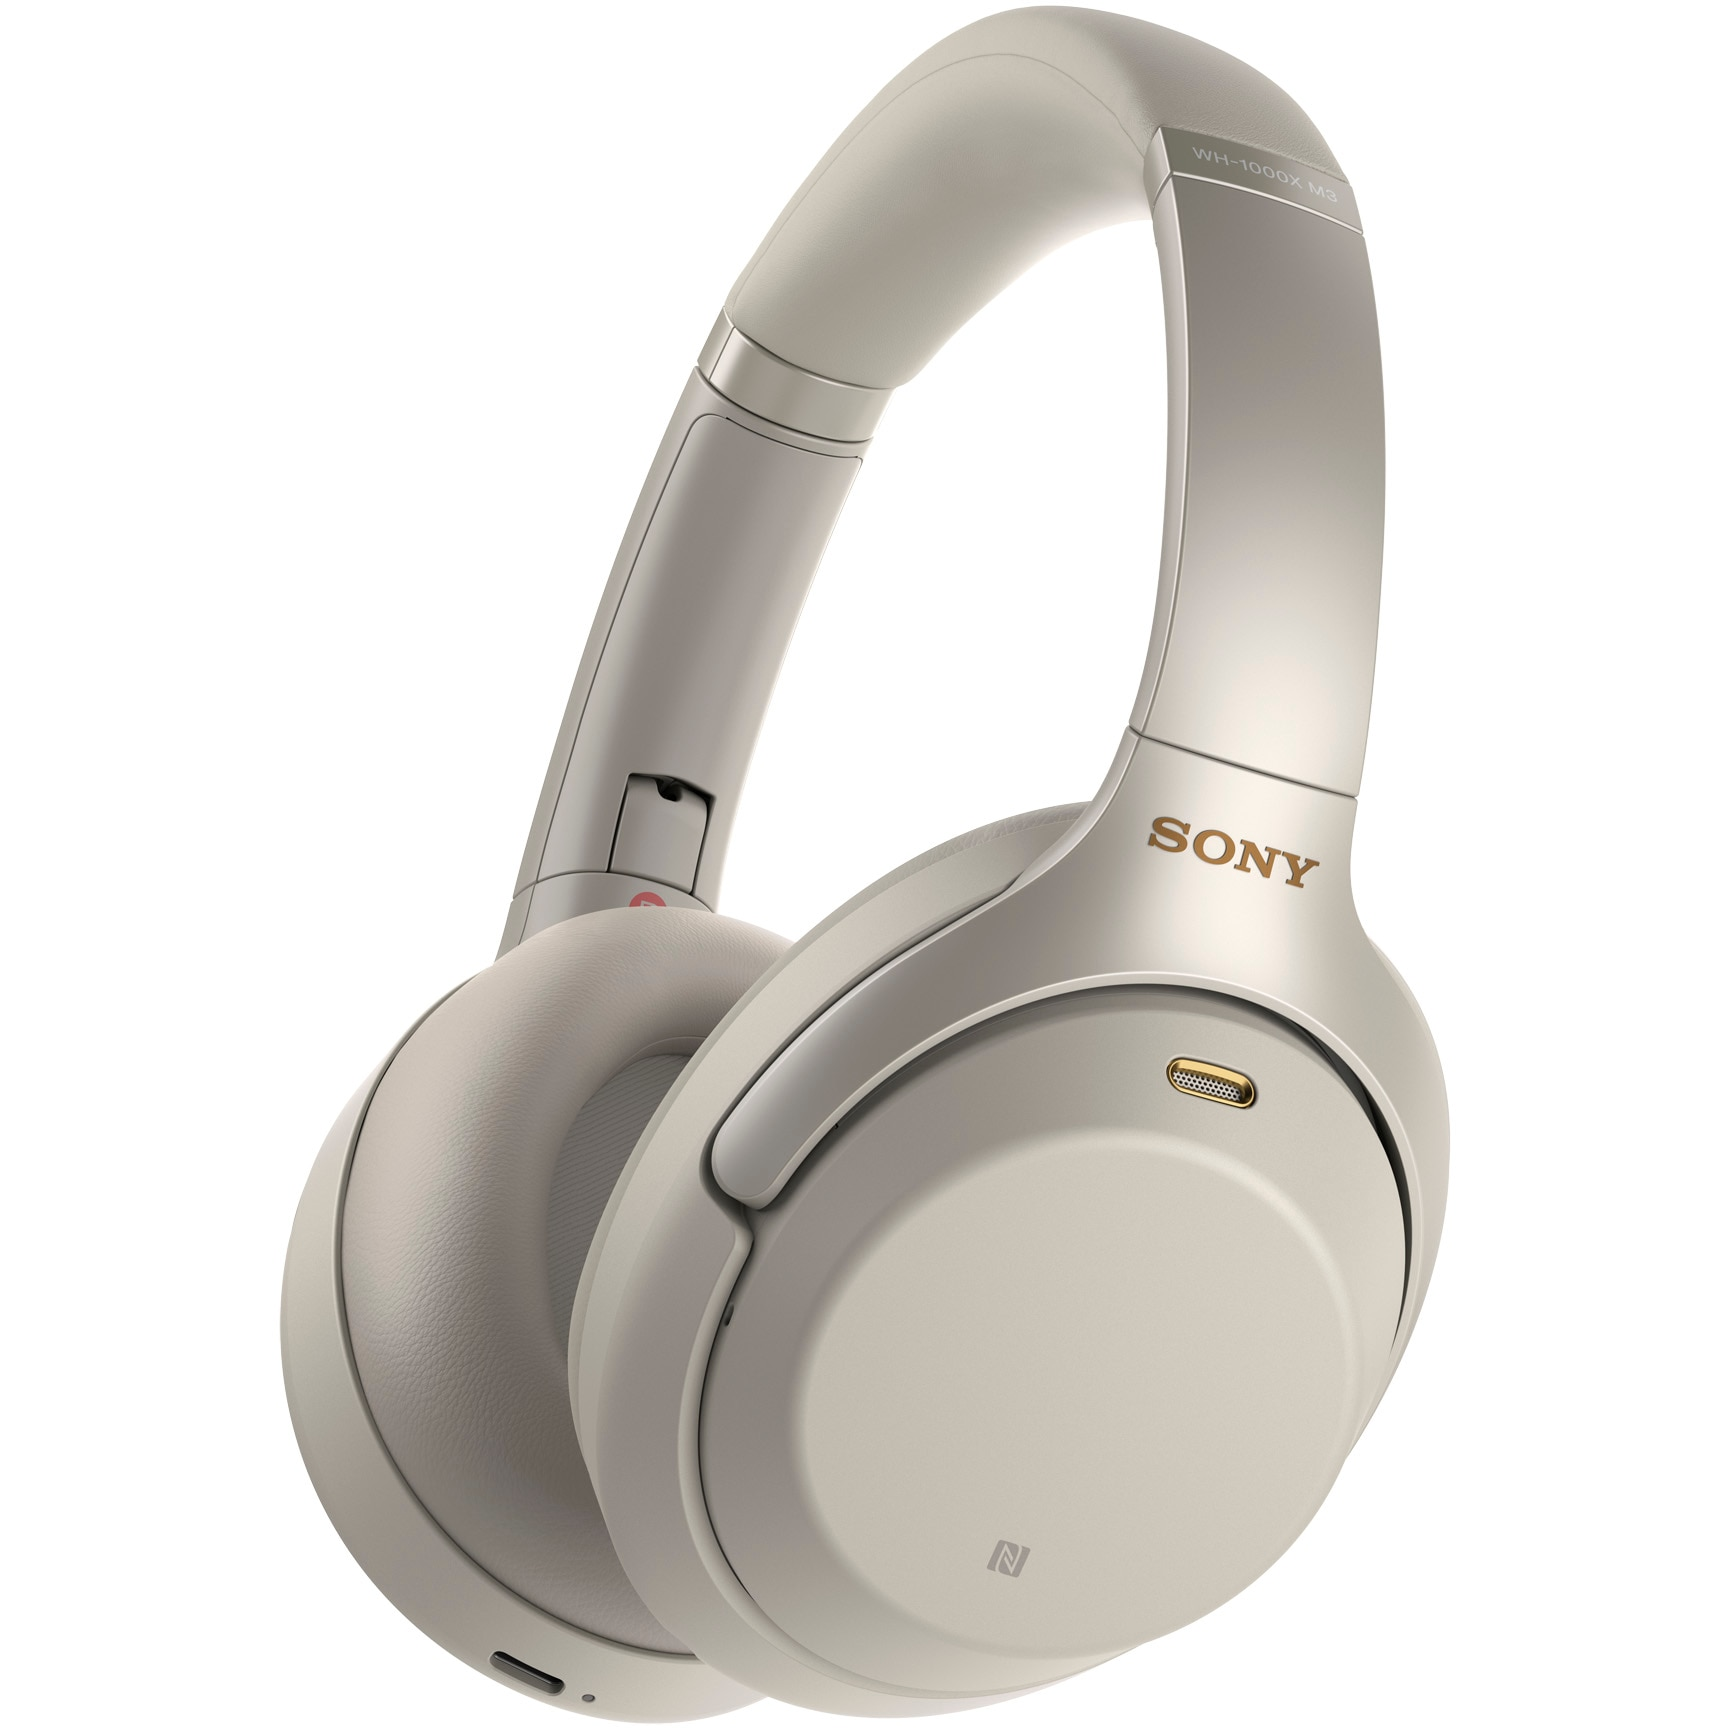 Fotografie Casti Sony WH-1000XM3S, Noise canceling, Hi-Res, Google Assistant, Wireless, Bluetooth, NFC, LDAC, Argintiu